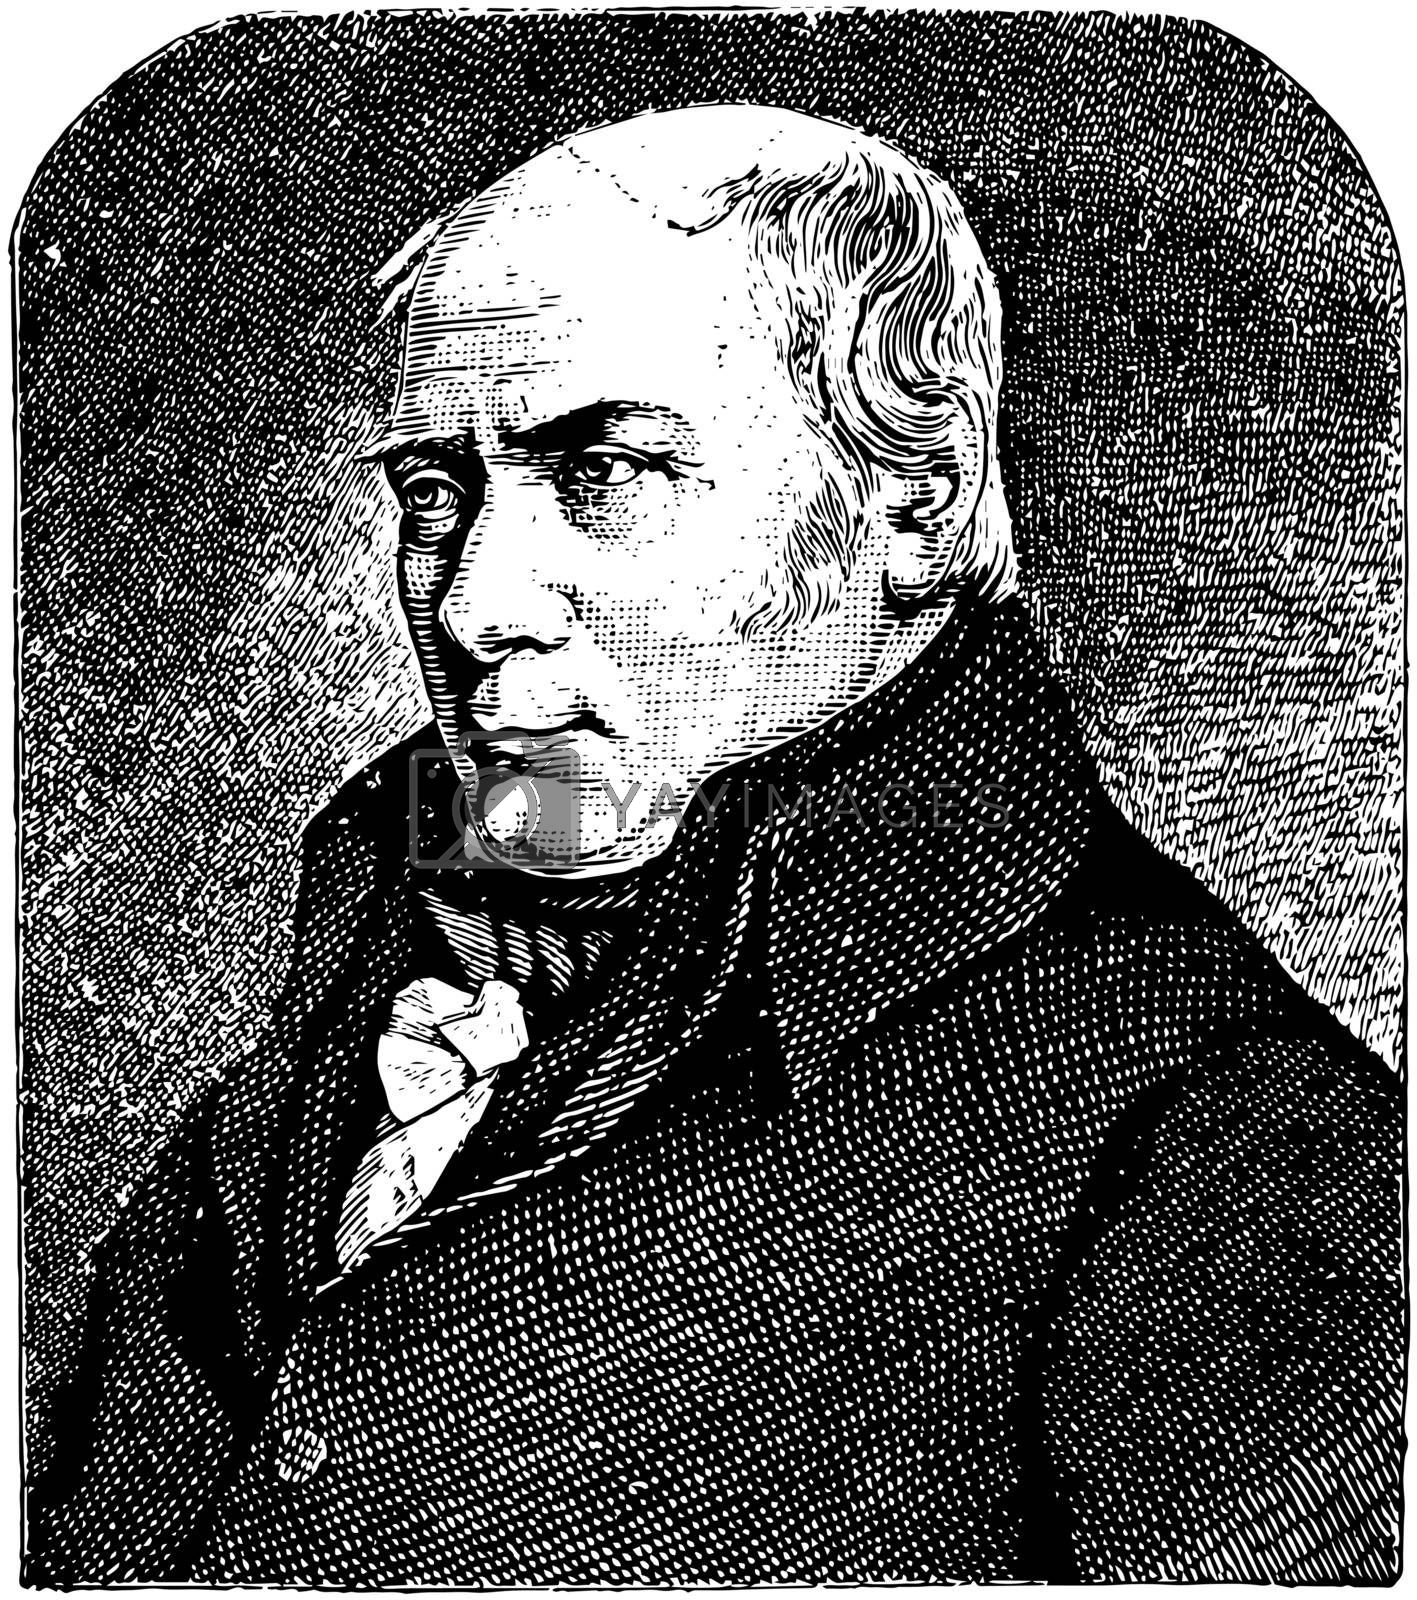 William Smith, vintage illustration by Morphart